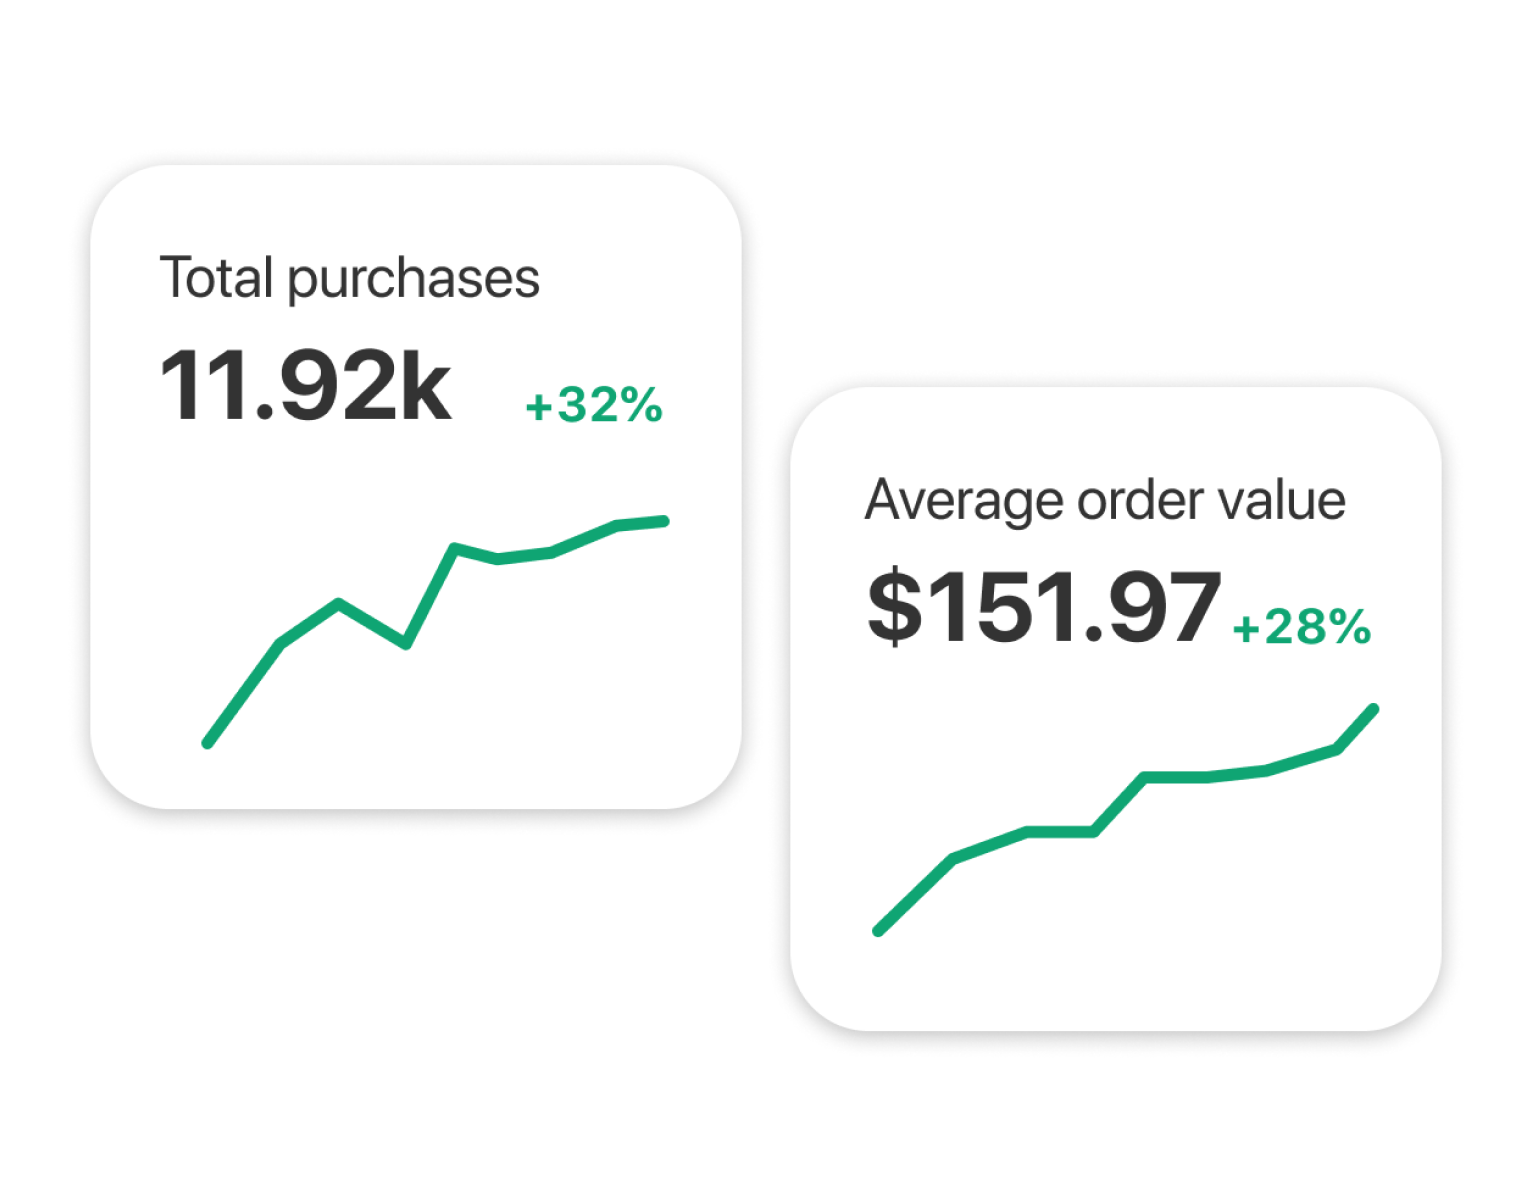 Pinterest verified merchant benefits conversion insights